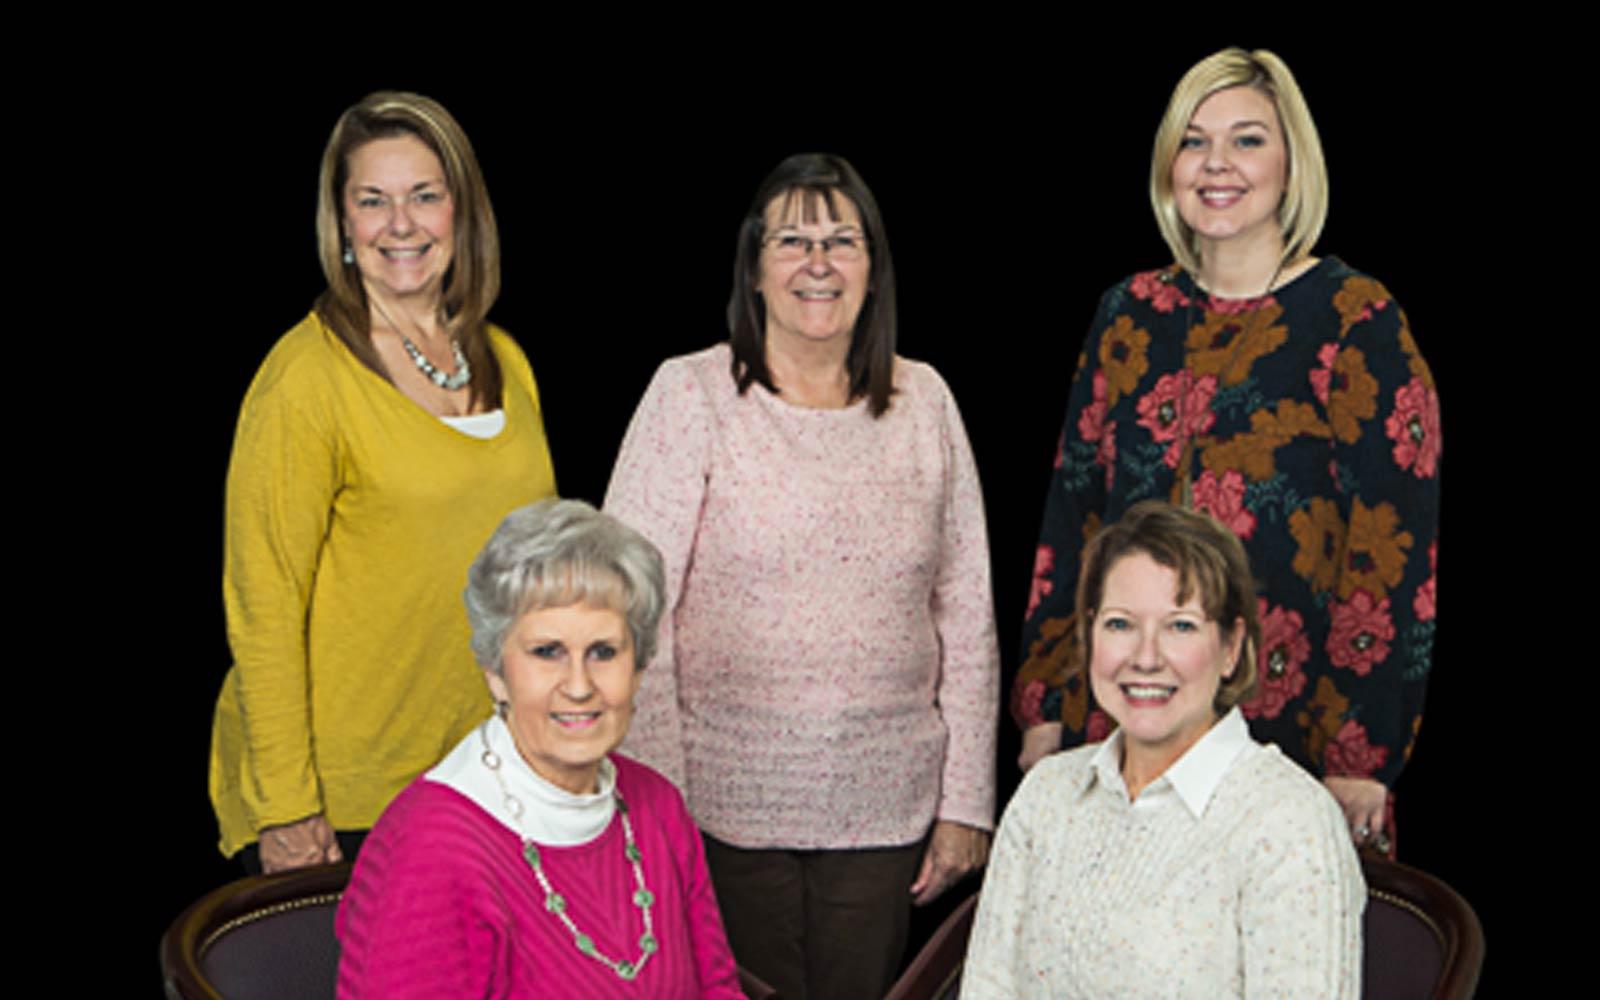 Row 1 - Sandra Hill, Karen Prendergast Row 2 - Laura Templin, Kim Hollifield, Casey Riley (L to R)